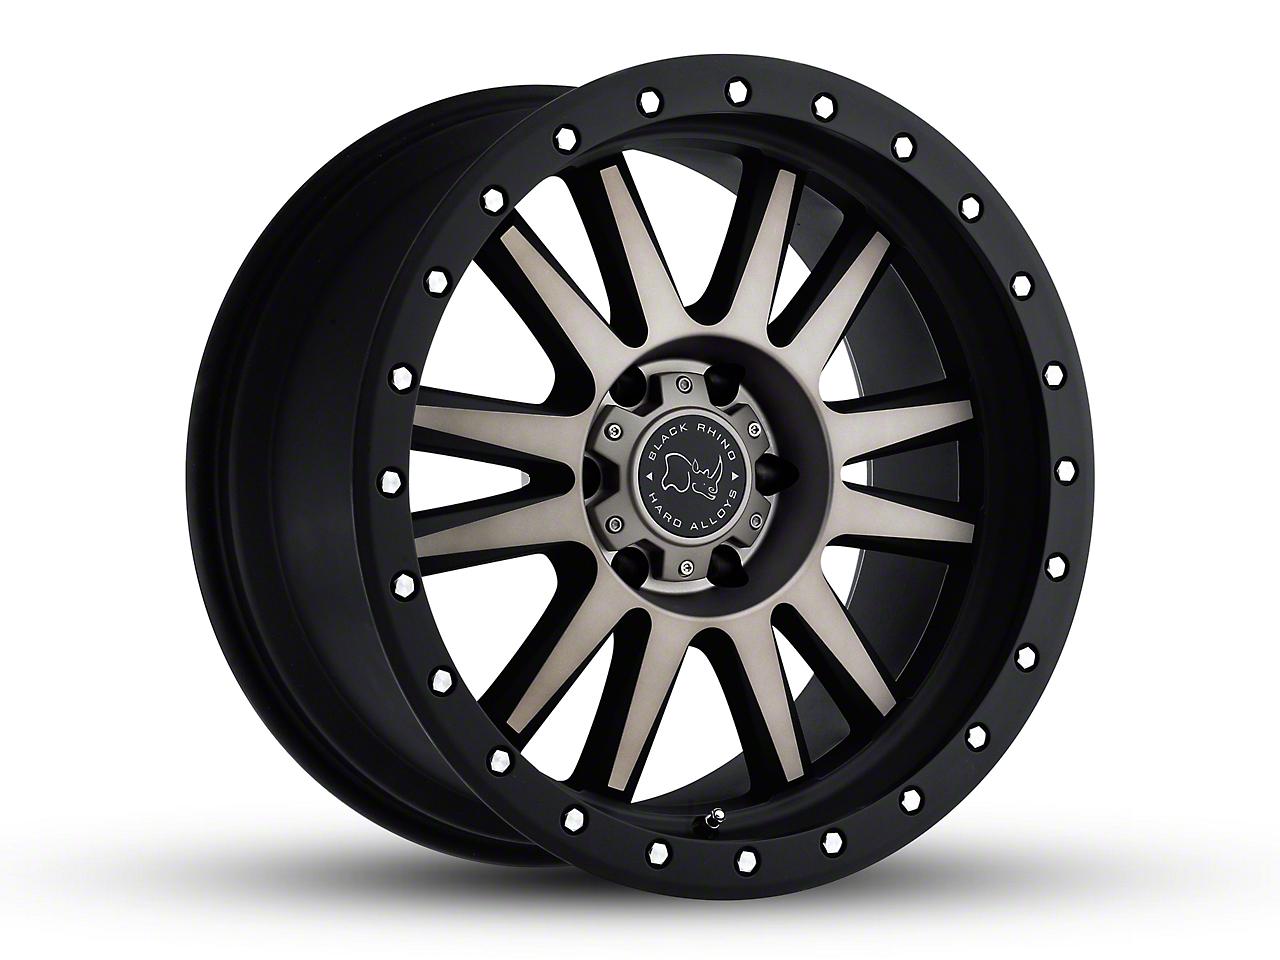 Black Rhino Tanay Matte Black Graphite Wheel - 17x9 (07-18 Jeep Wrangler JK; 2018 Jeep Wrangler JL)